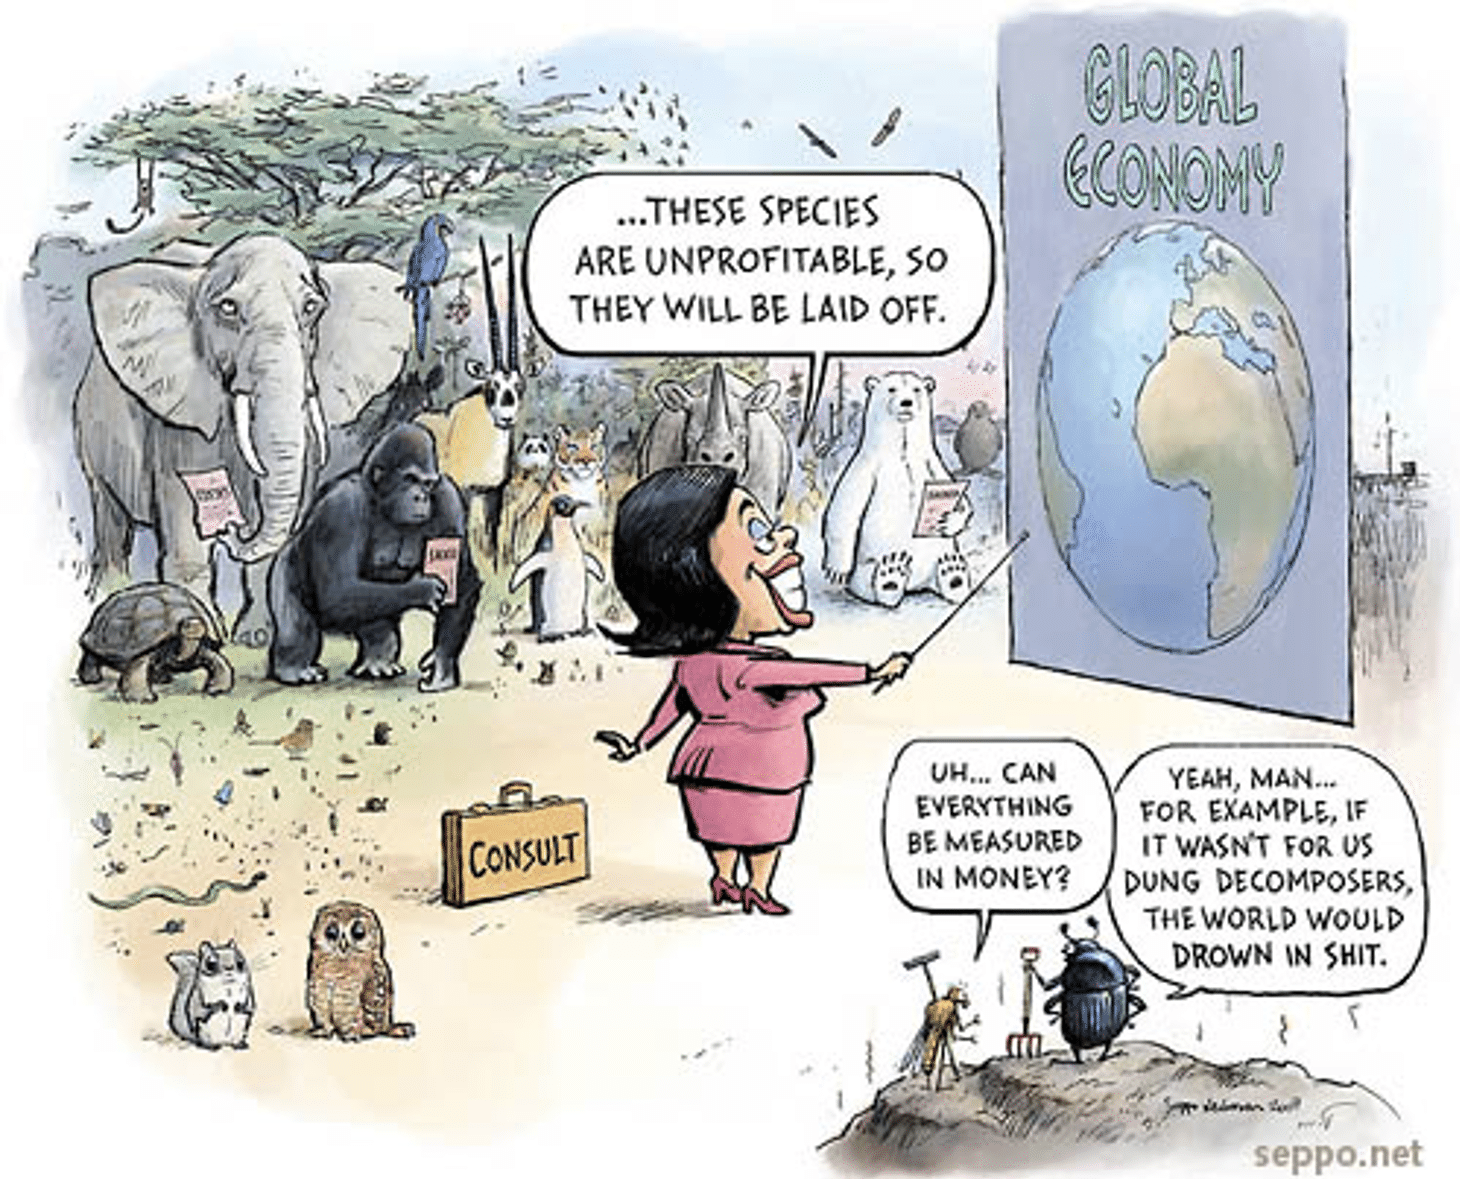 Biodiversity Leadership